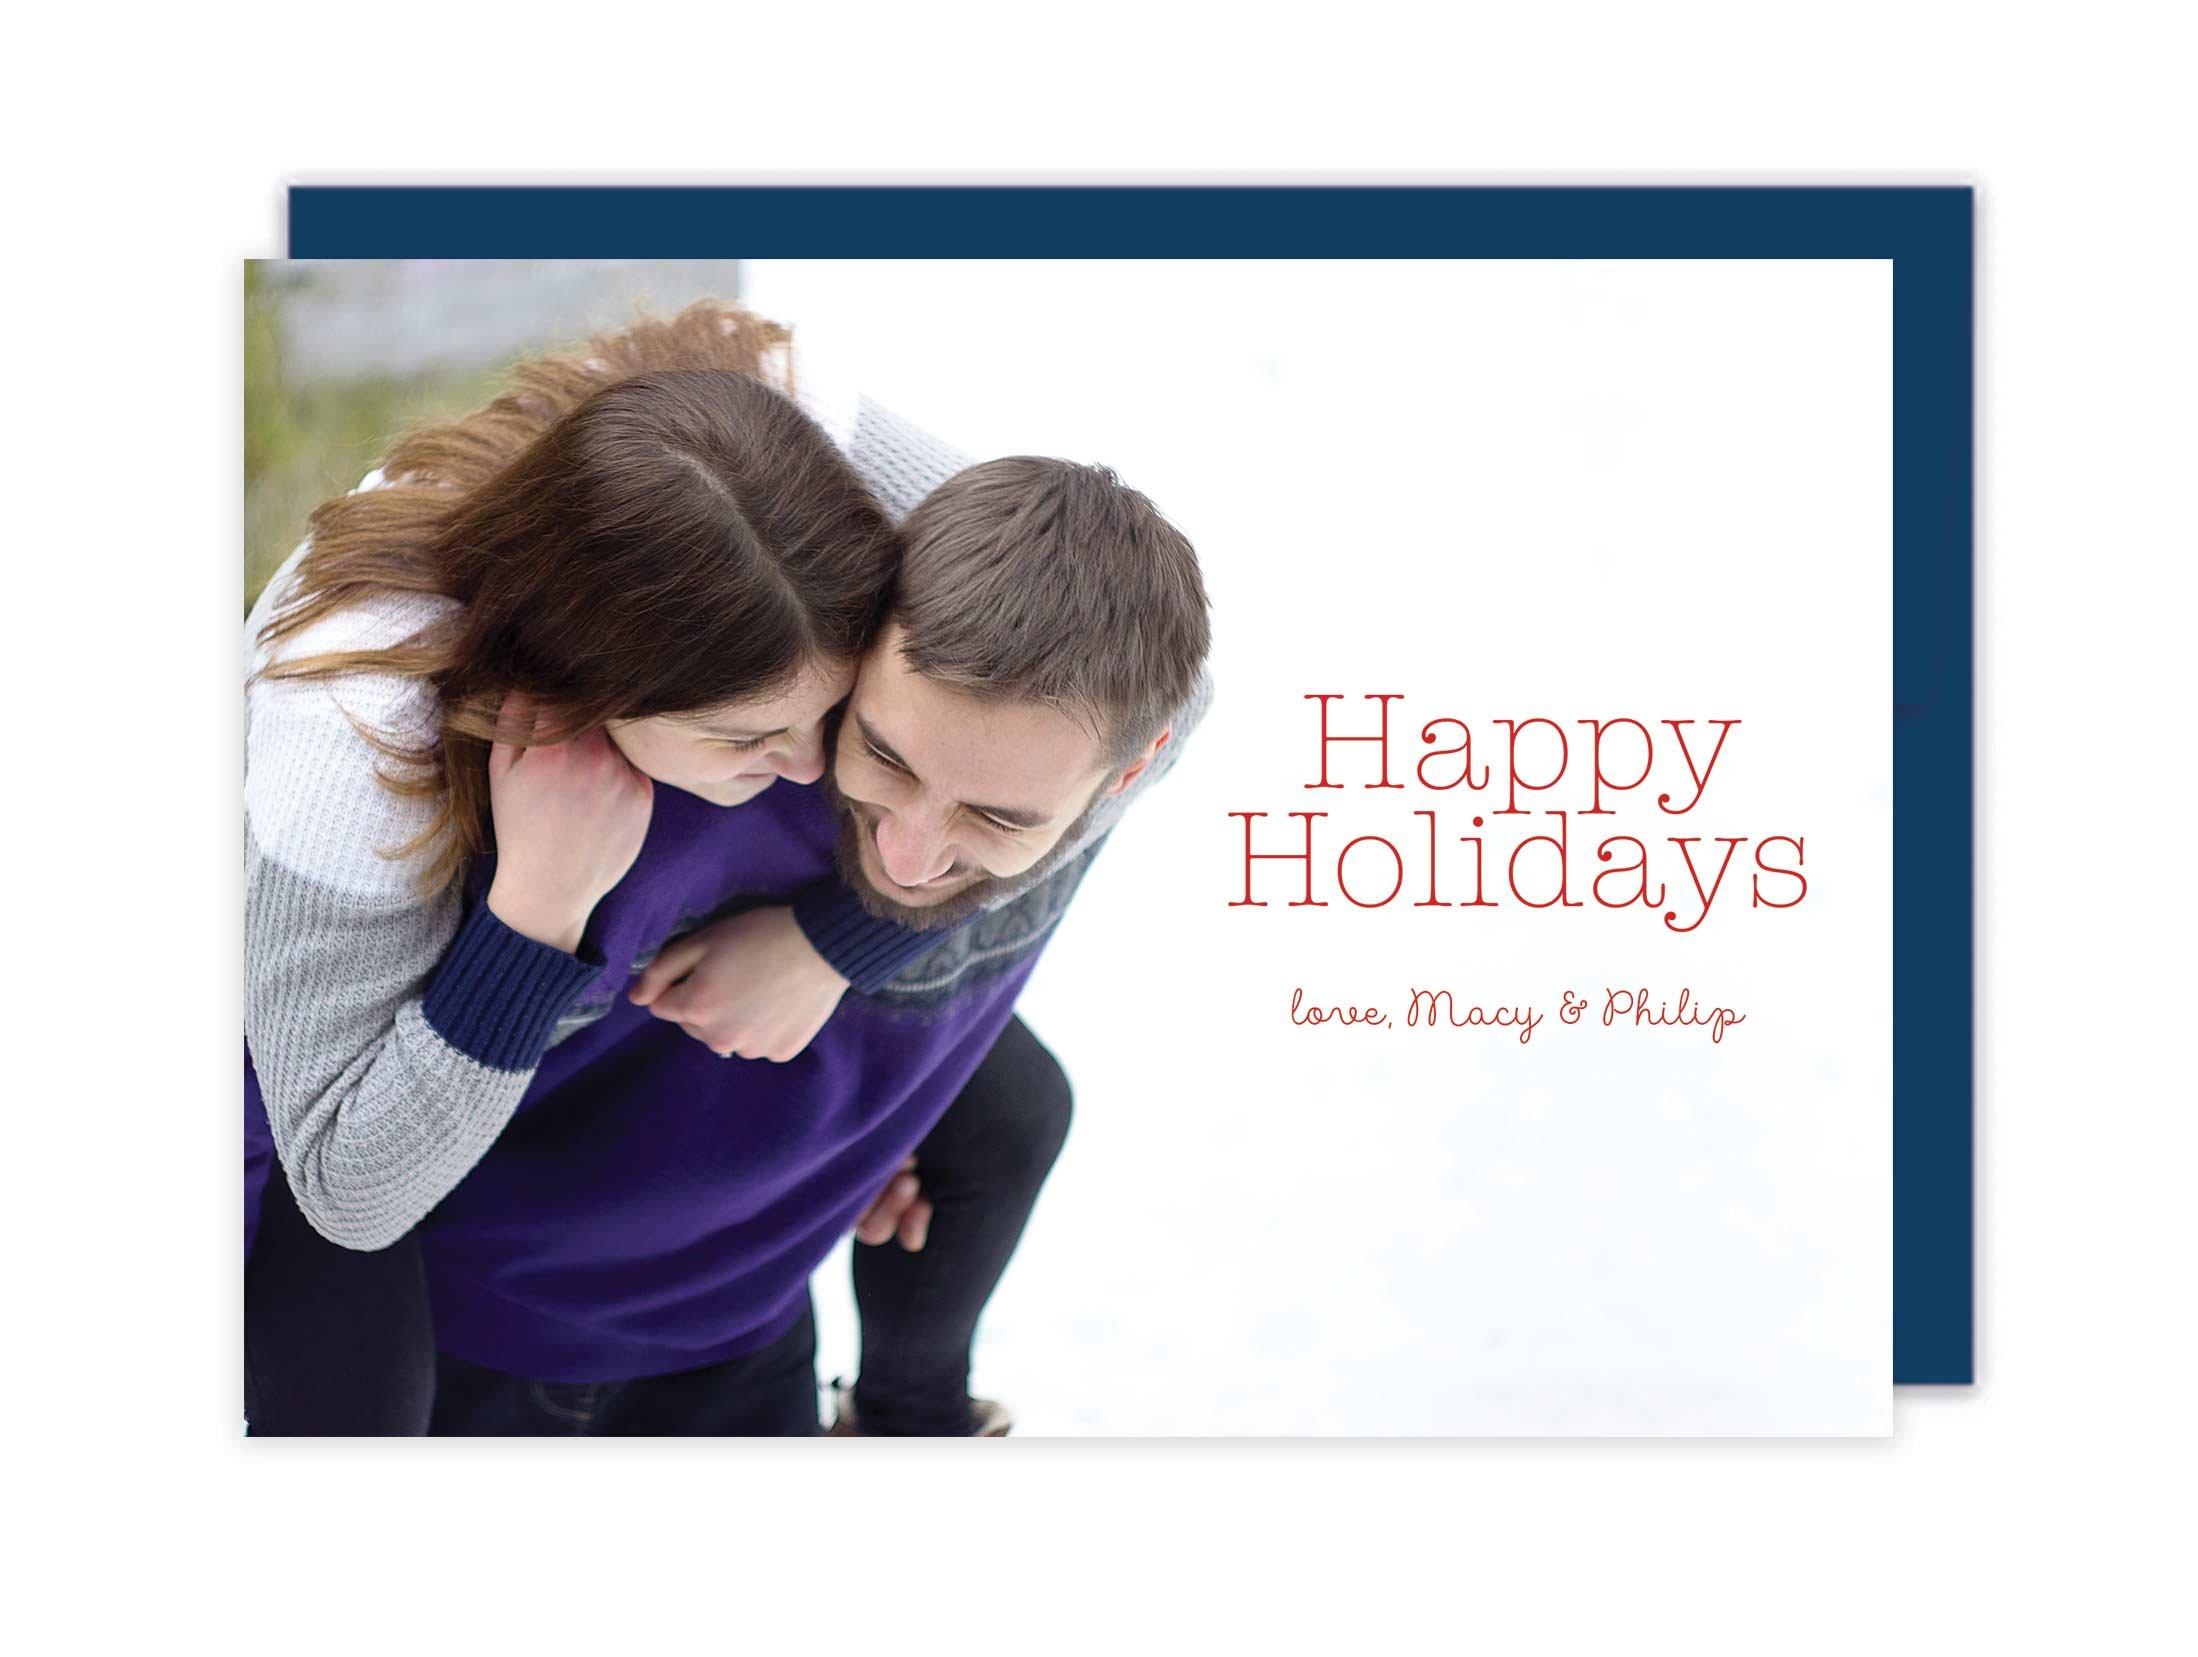 Letterpress Photo Christmas Cards - Happy Holidays